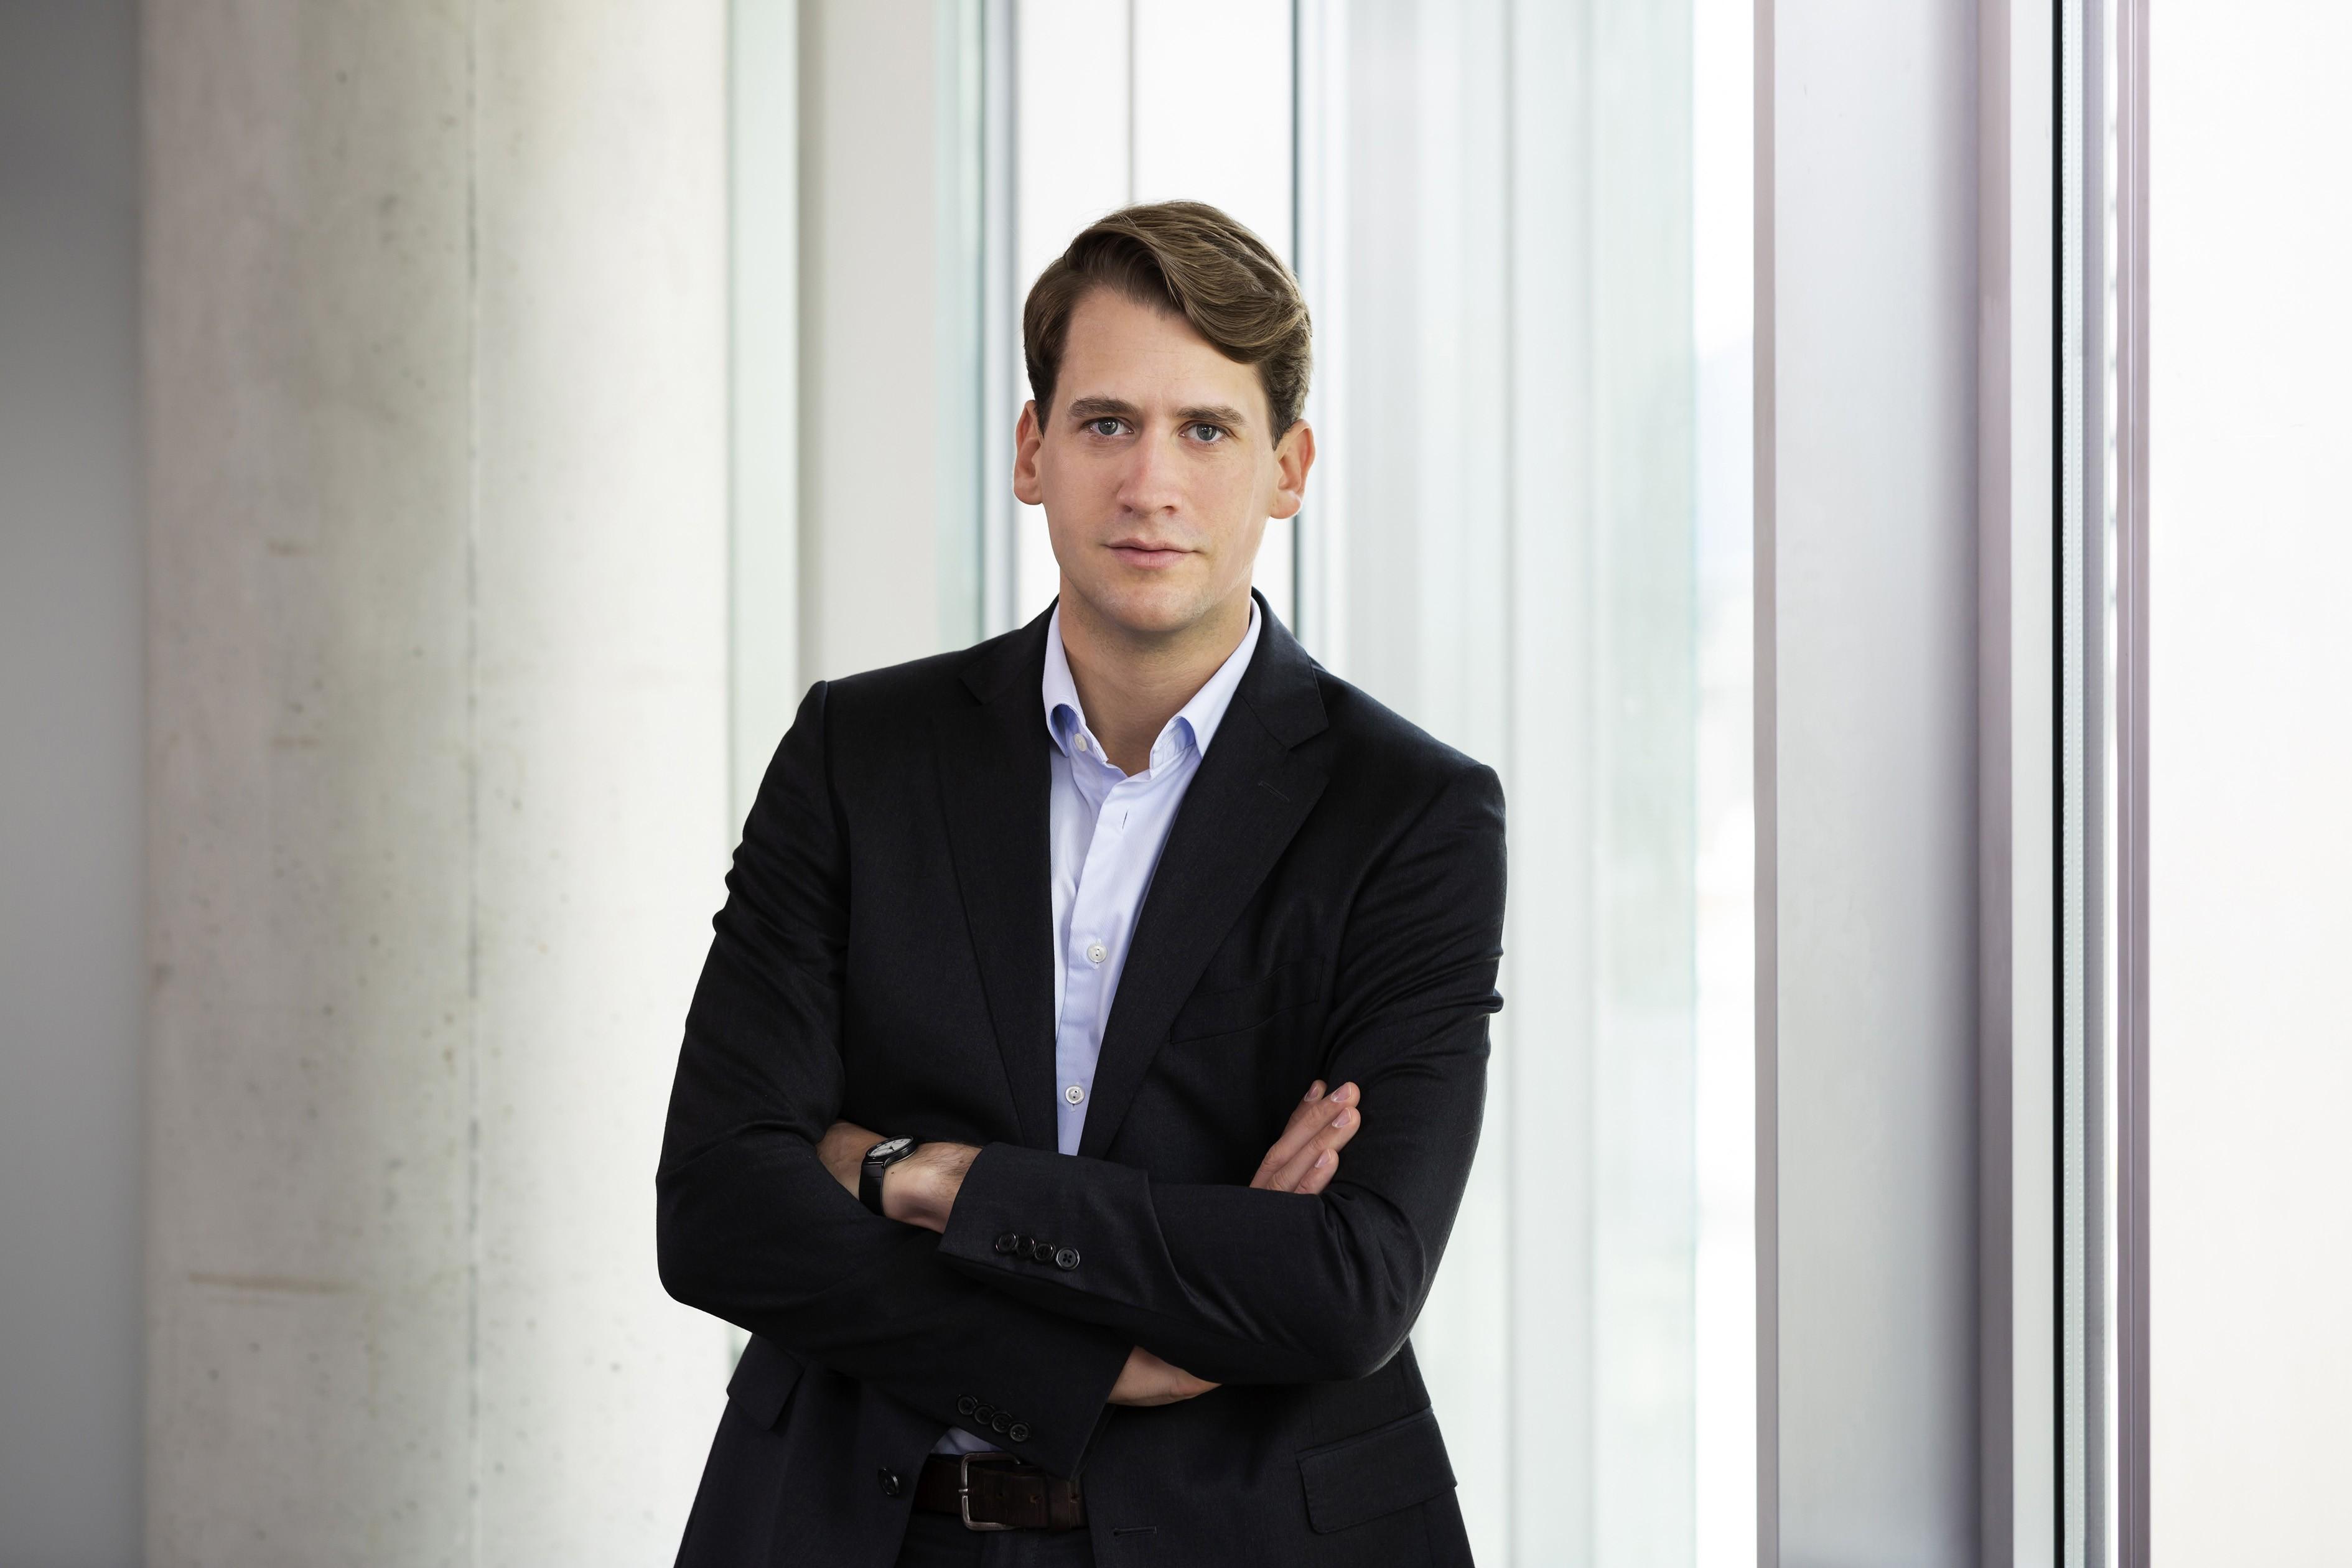 Albert Achammer, Managing Director, ATP Hamburg.<br><span class='image_copyright'>ATP/Rauschmeir</span><br>